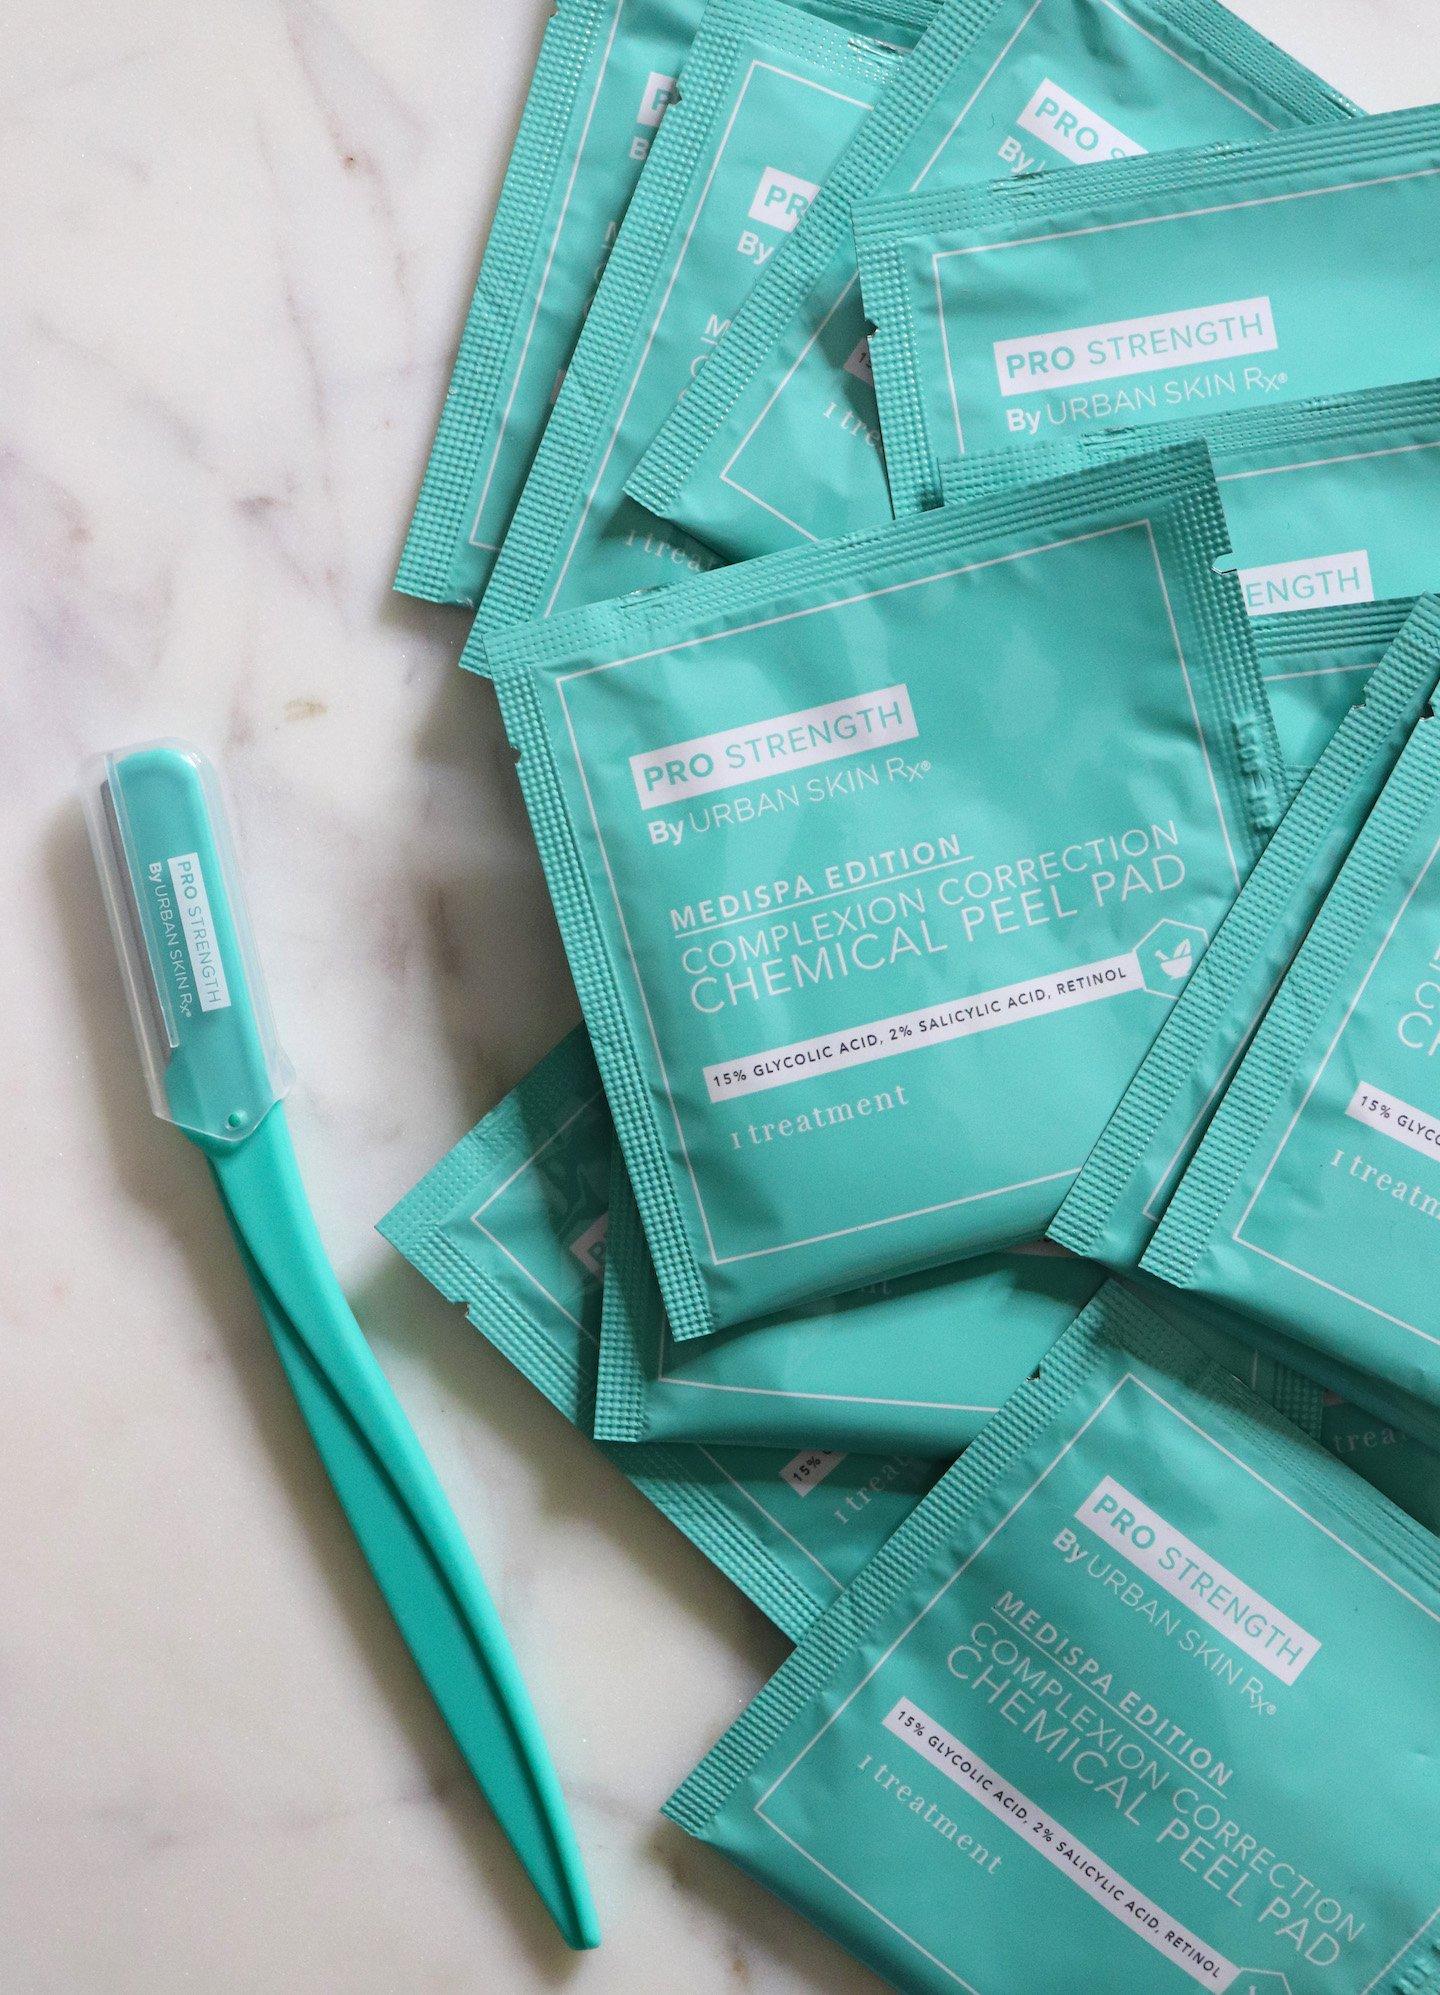 rban Skin Rx Dermapeel Smooth & Glow 2 Step System